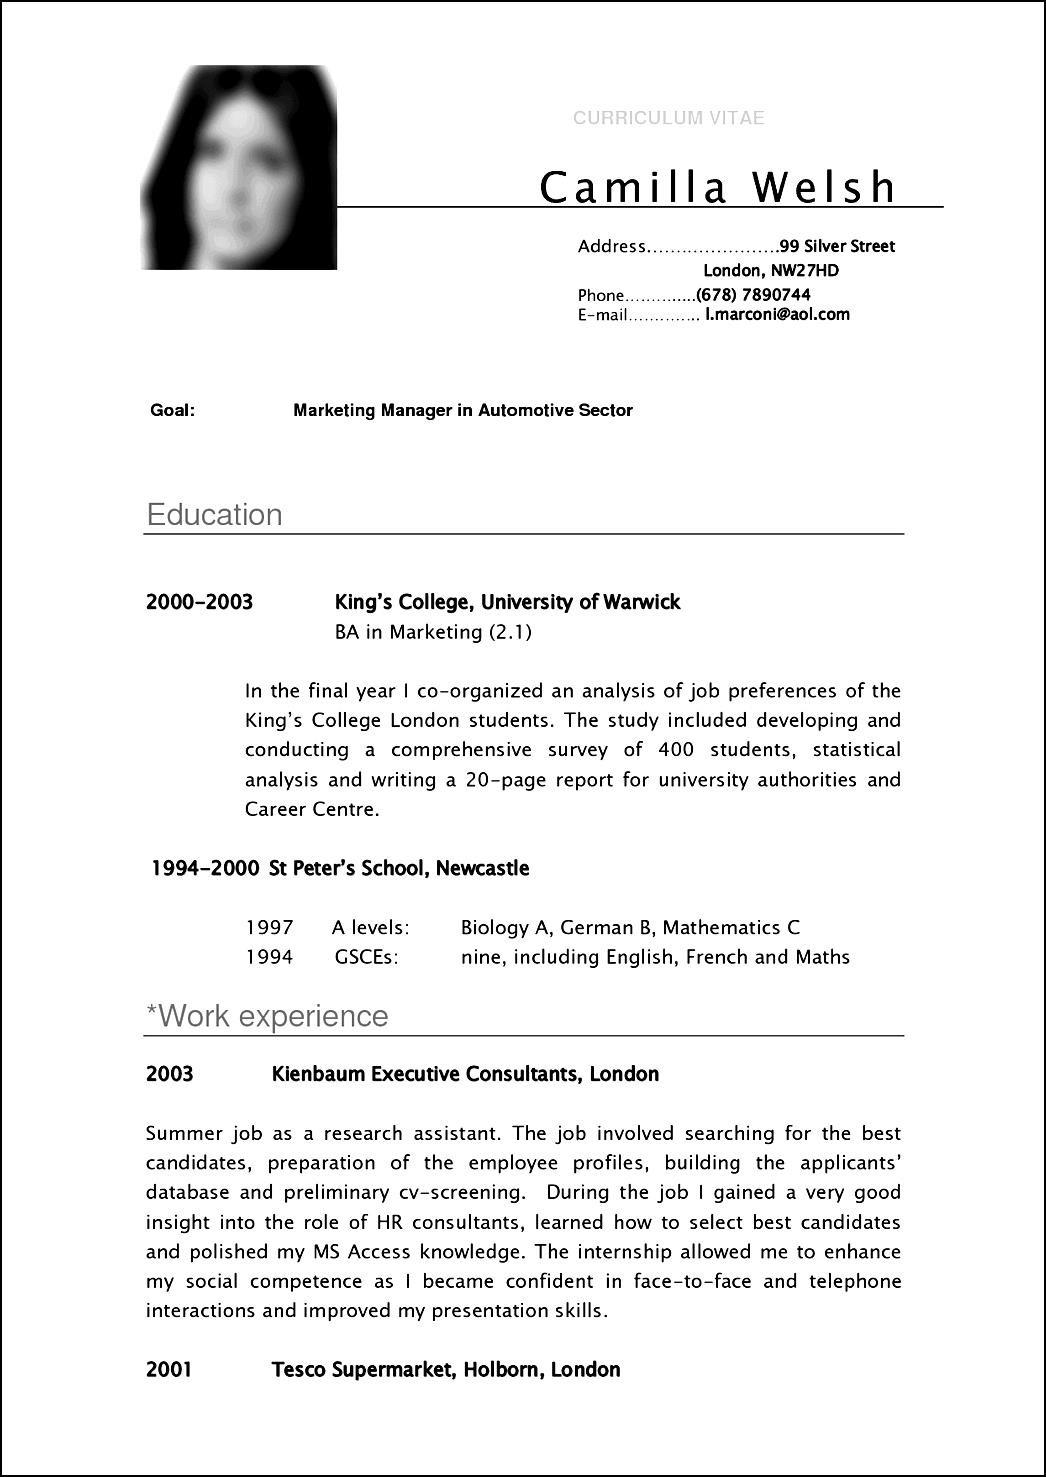 inspirational resume cv format curriculum vitae format for students